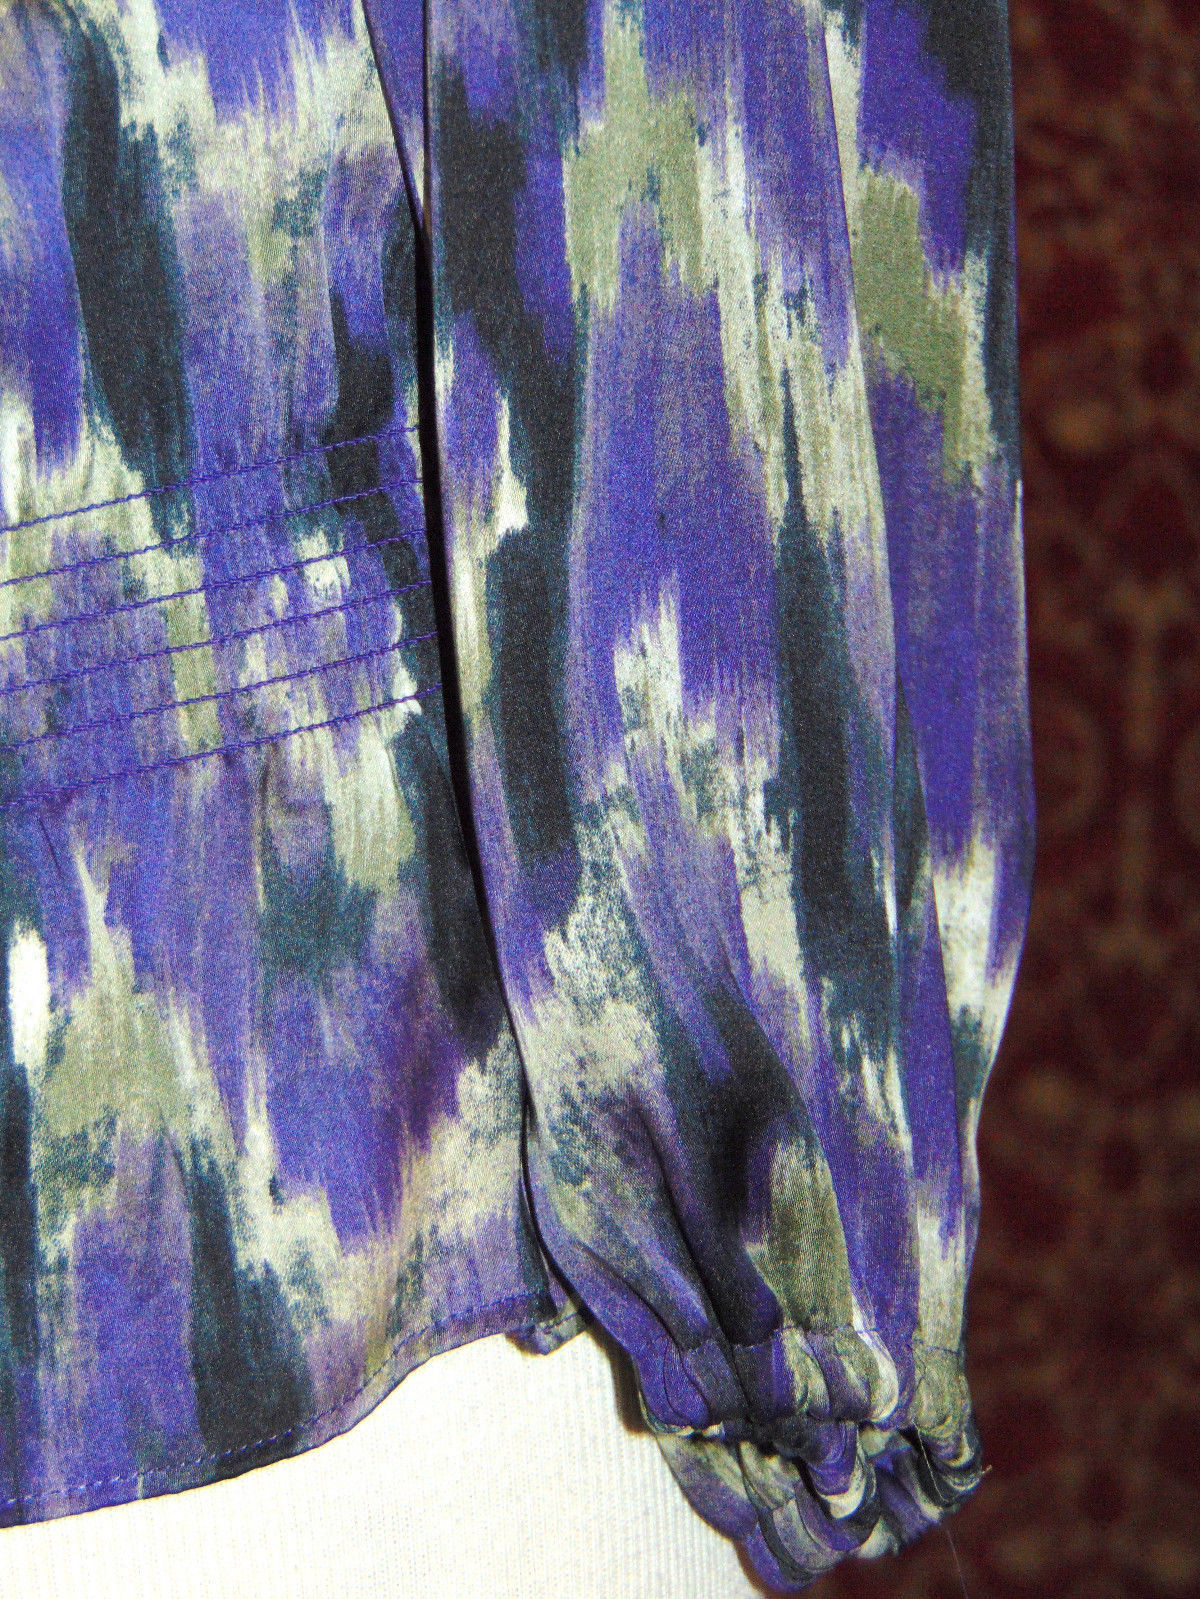 MICHAEL KORS purple polyester long sleeve blouse M (T47-01C8G) image 6